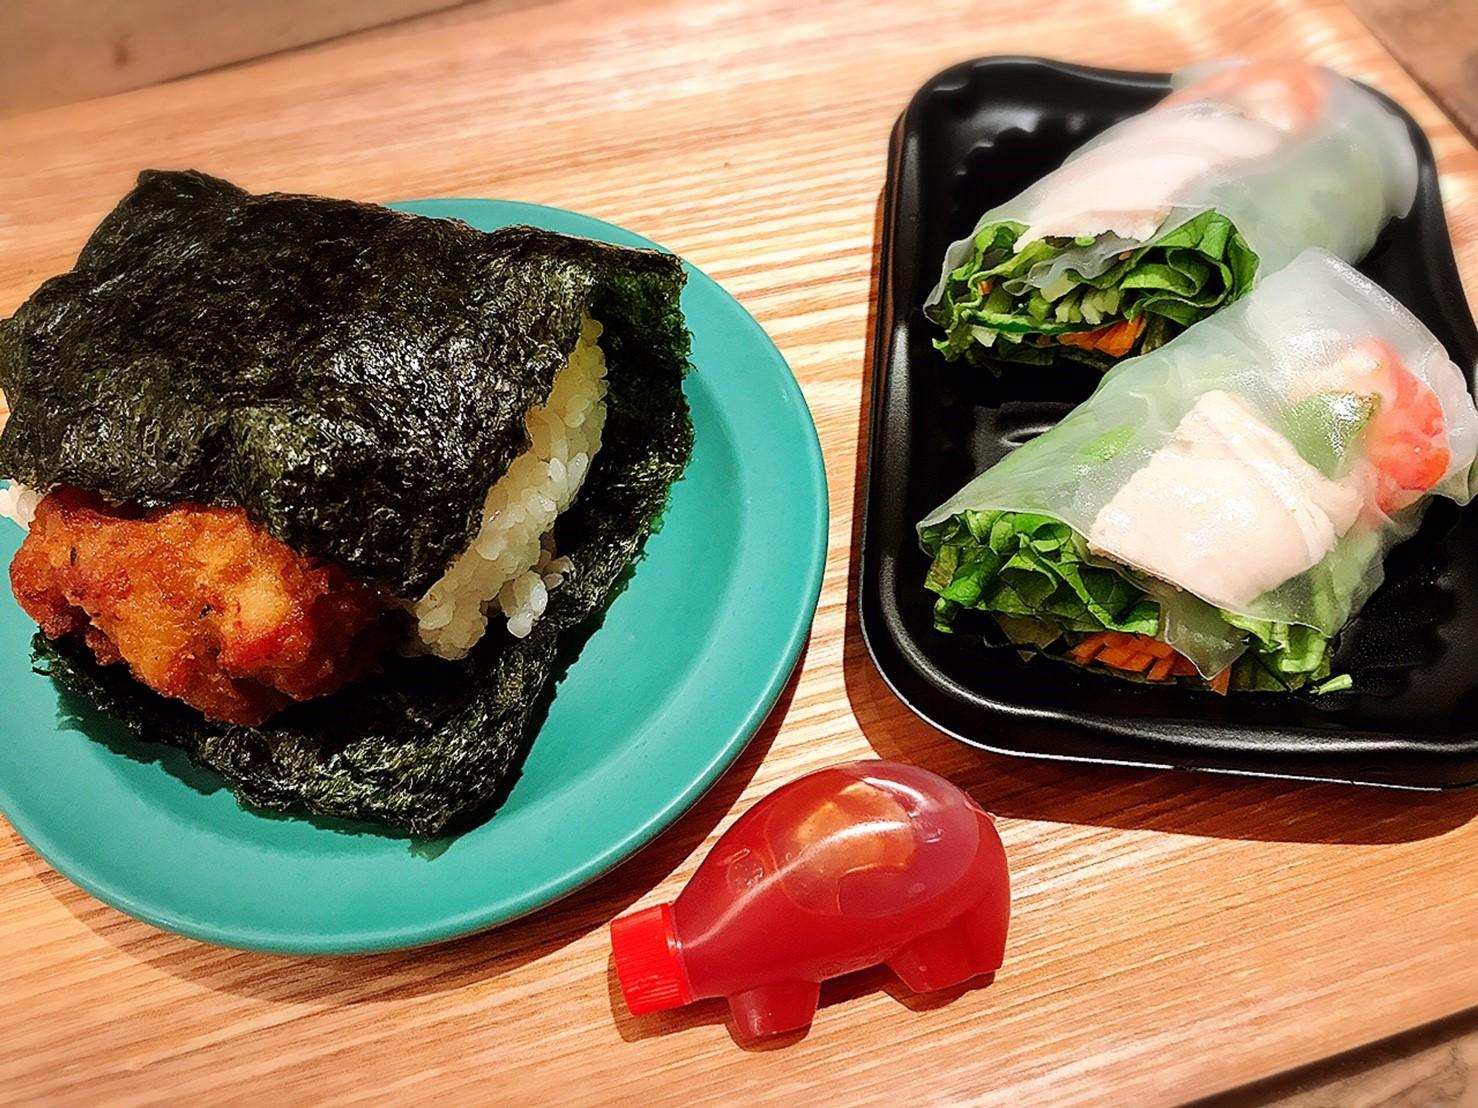 亜細亜的惣菜店 マンハッタン/札幌市 厚別区_c0378174_13104489.jpg